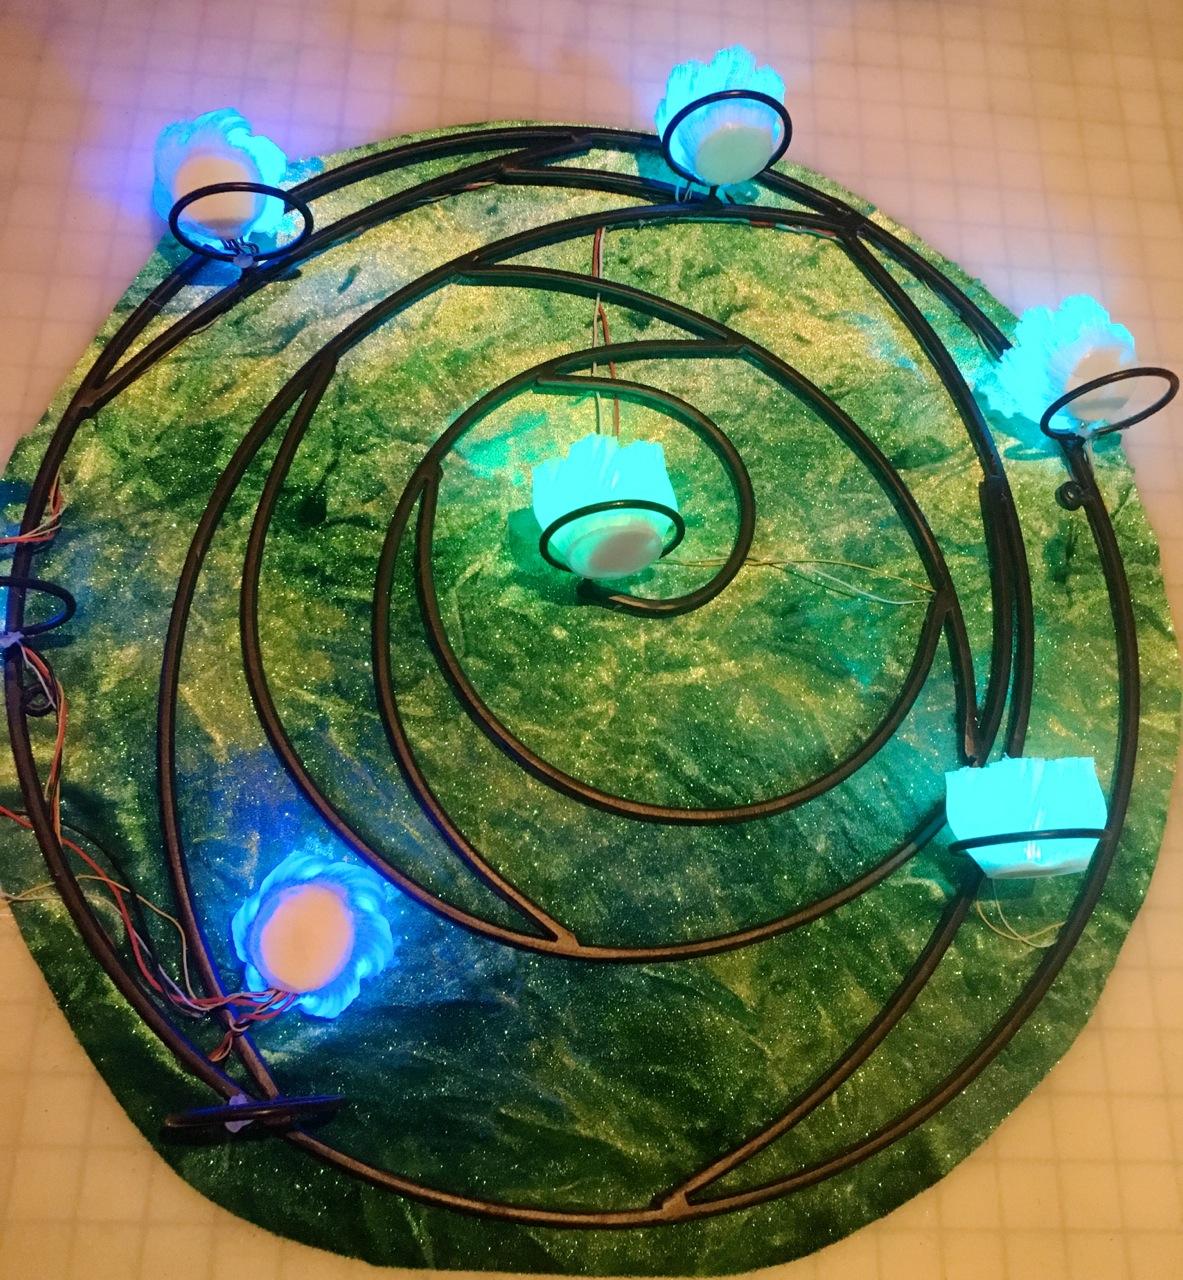 sensors_fabric_layout.jpg